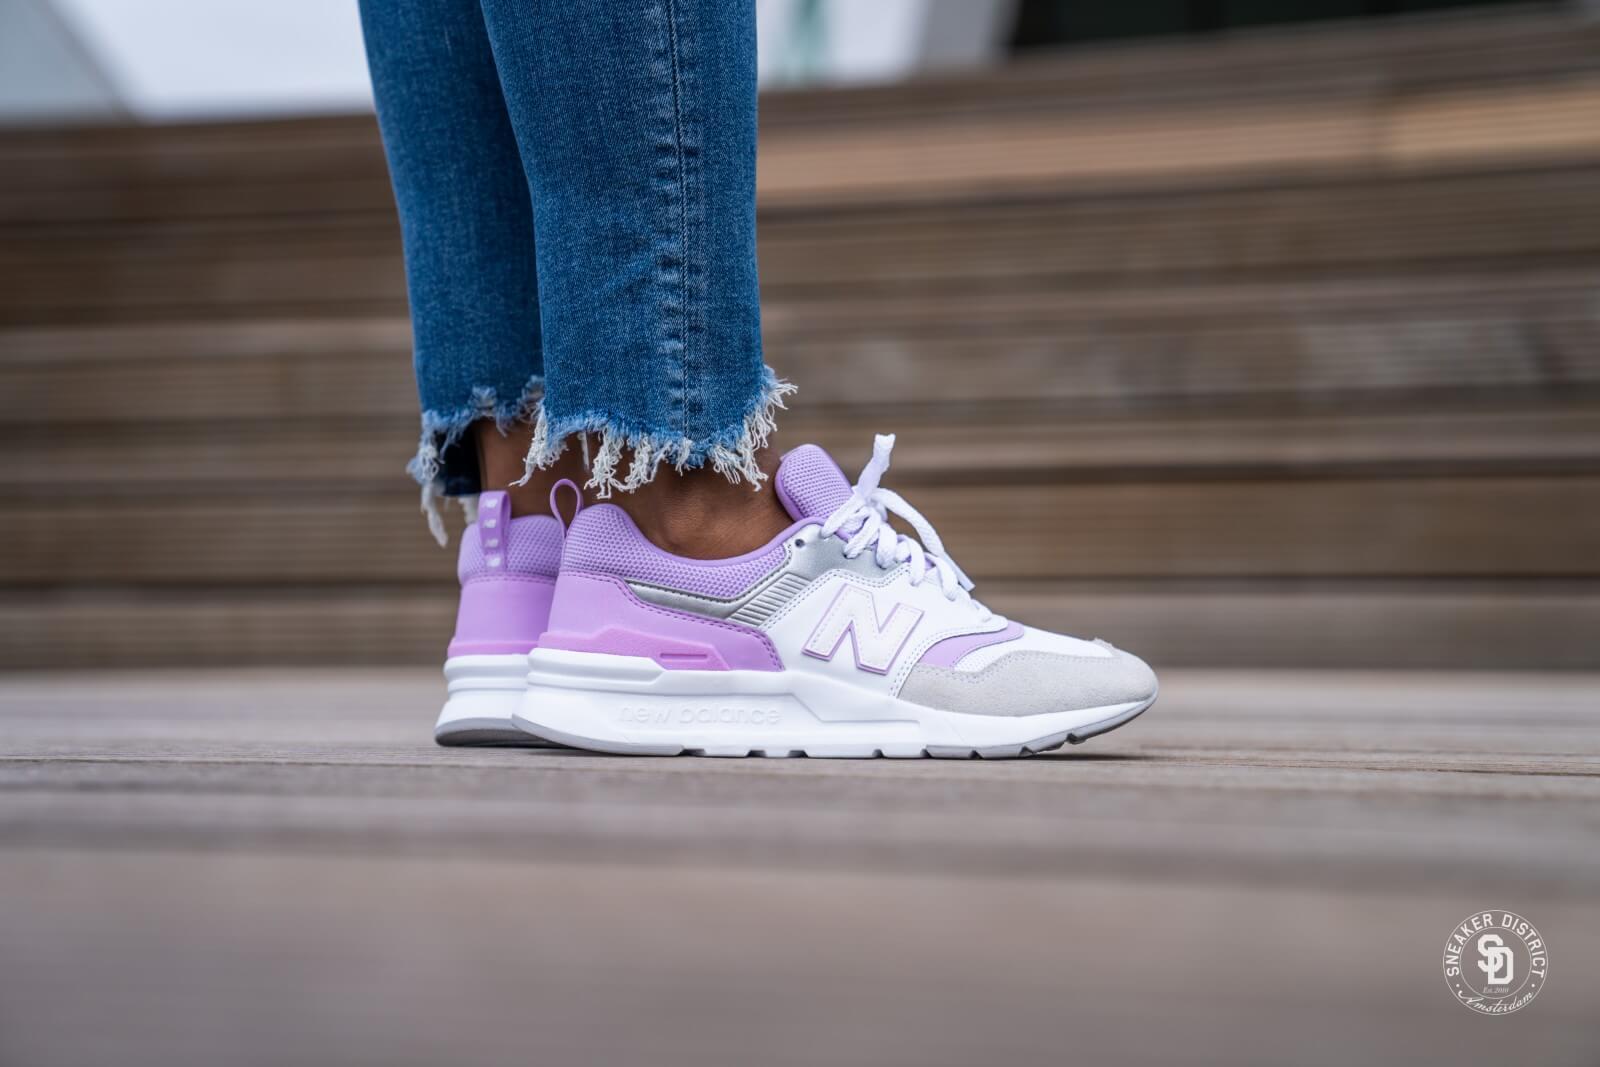 New Balance CW997 HEA Pink/White